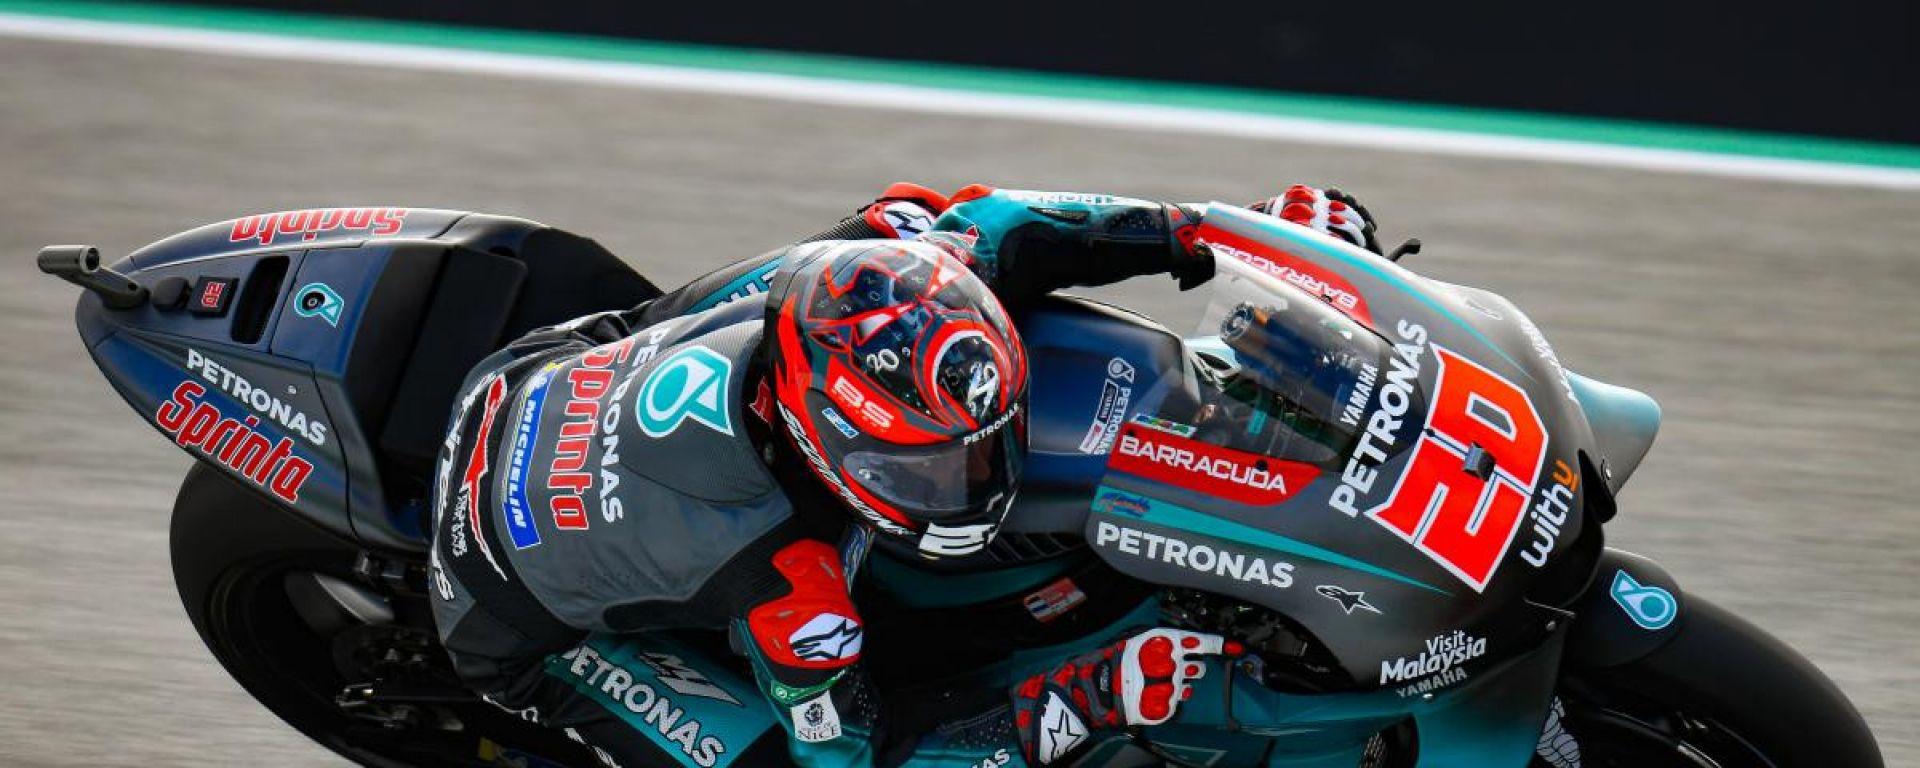 MotoGP Assen, FP3: Quartararo davanti a tutti, Rossi in Q1